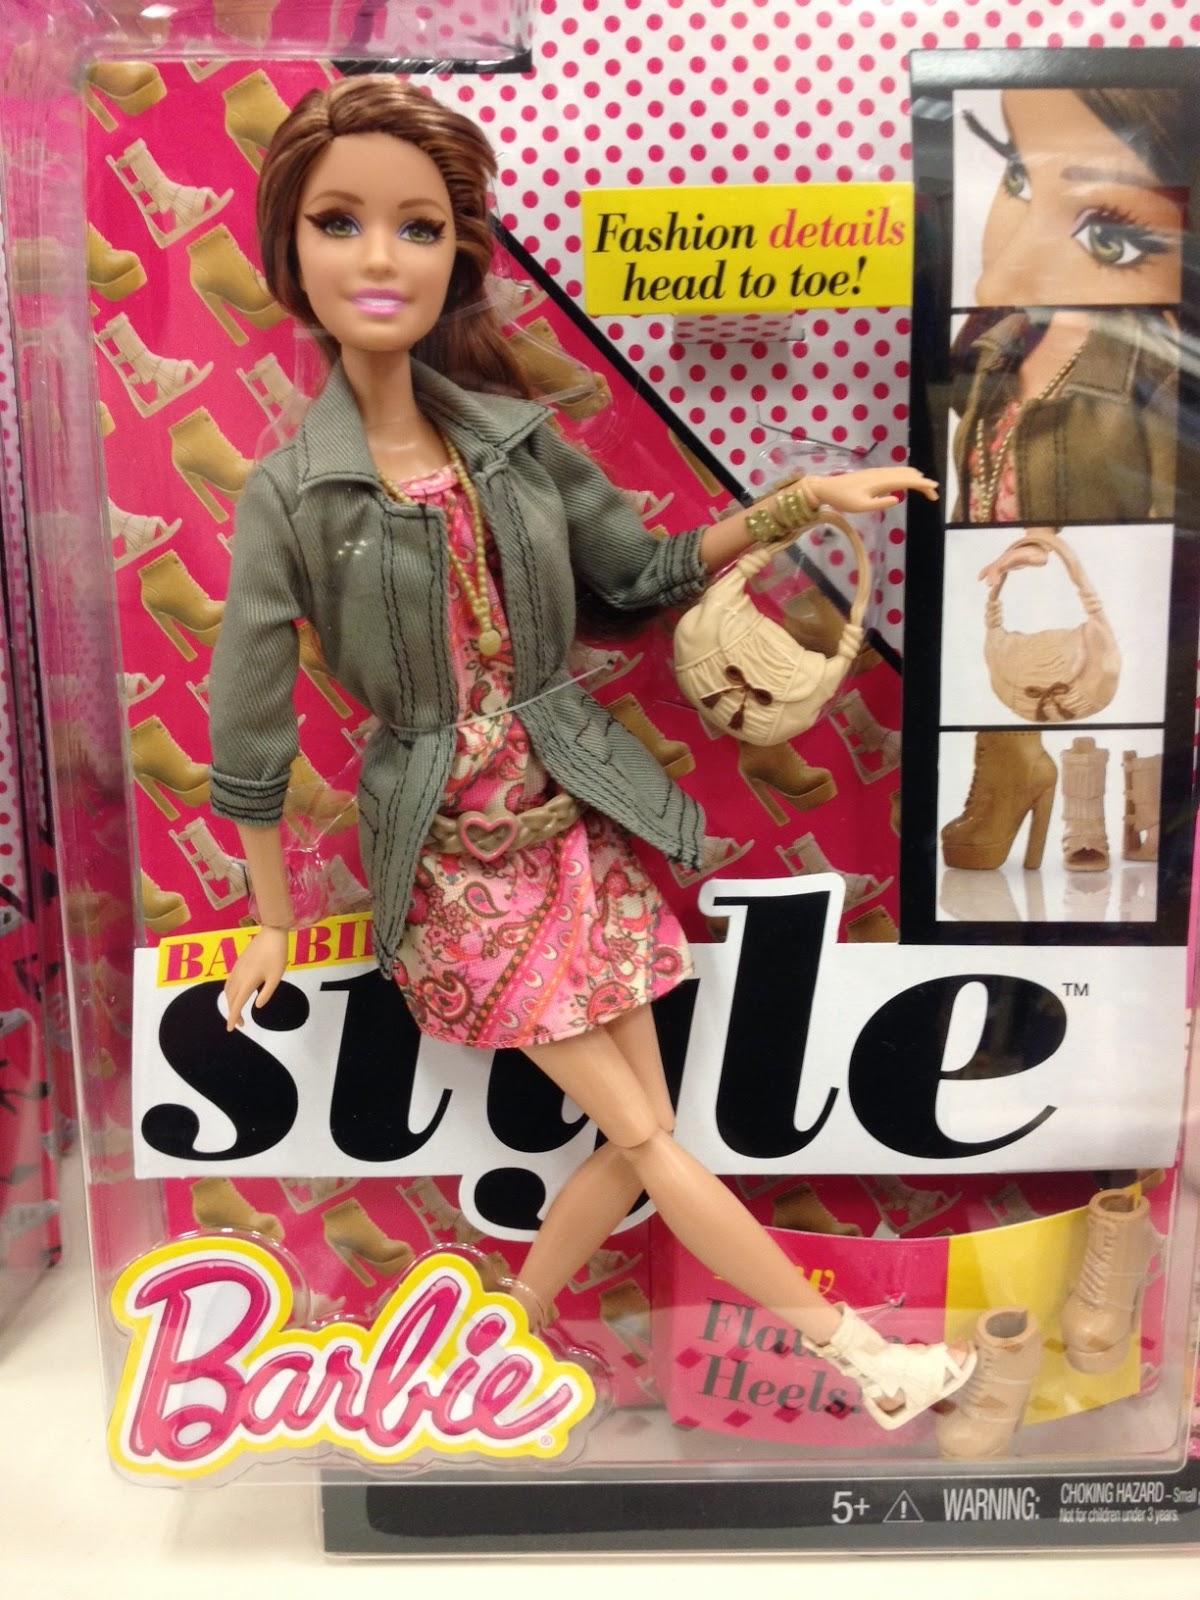 Doll lightful new barbie style dolls target revised - Barbie barbie barbie barbie barbie ...